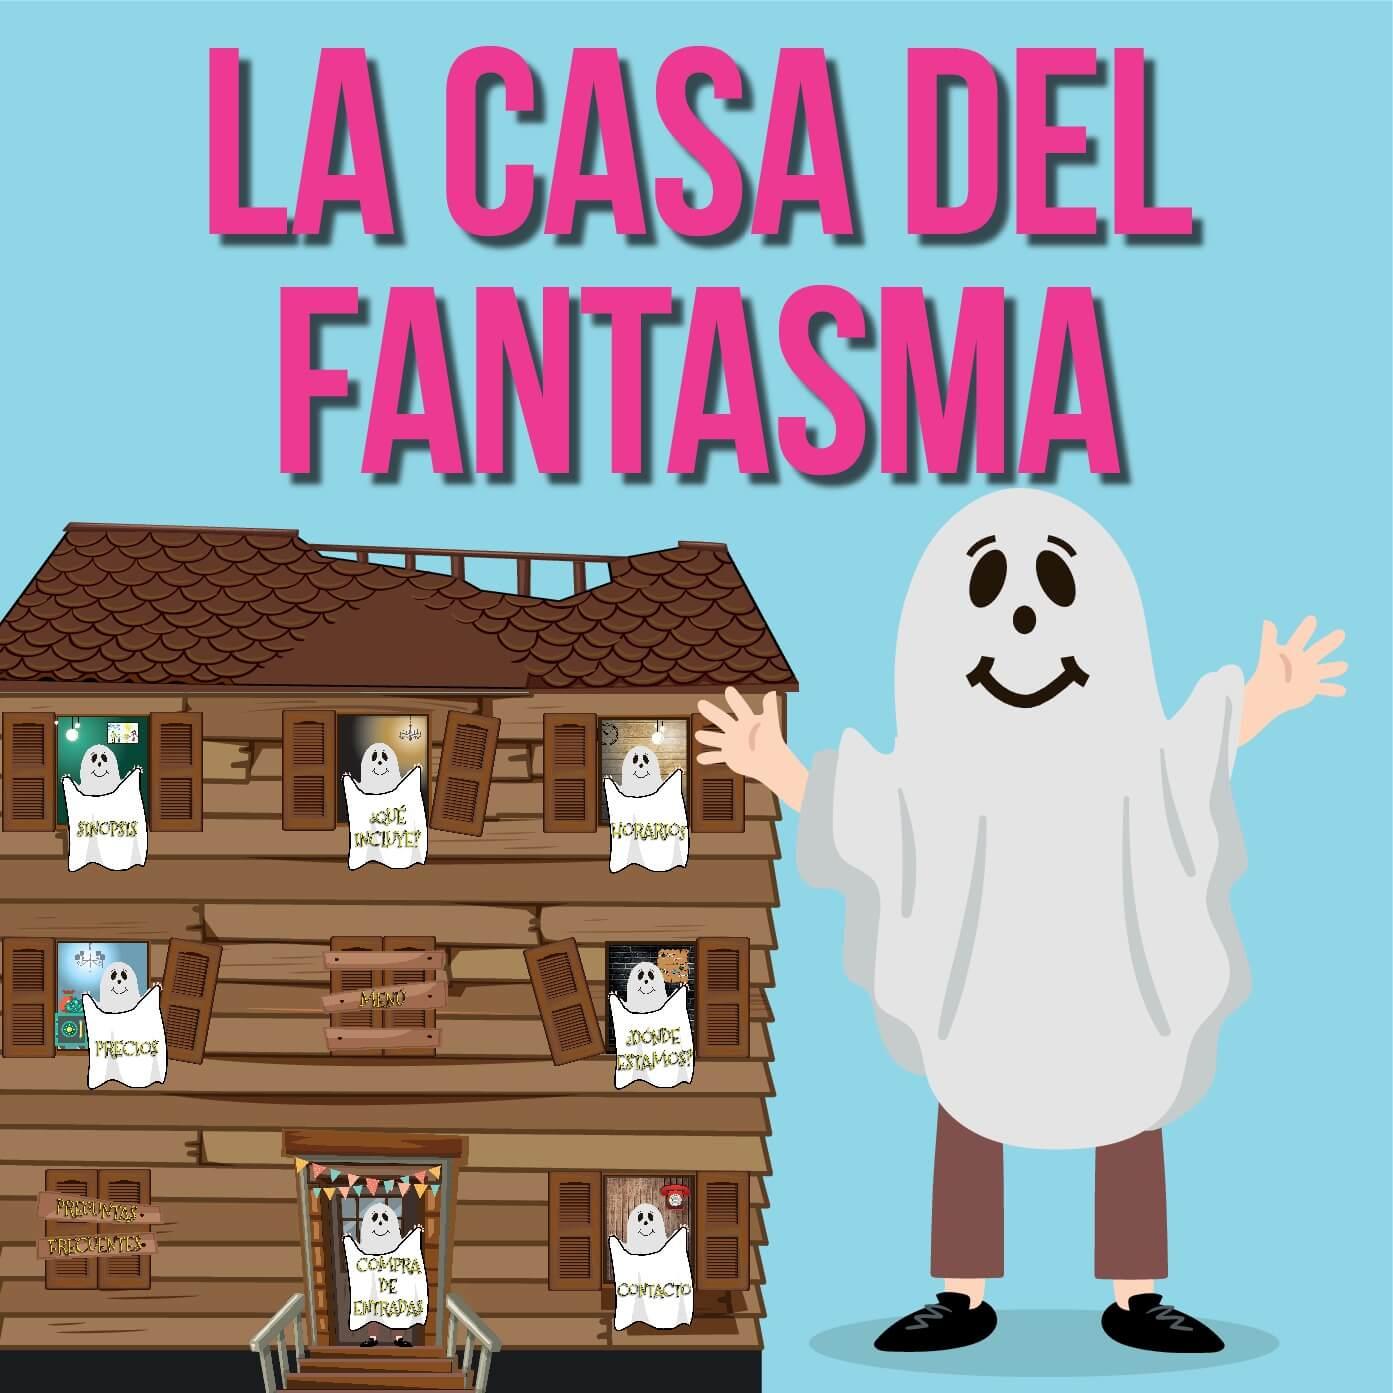 La Casa del fantasma